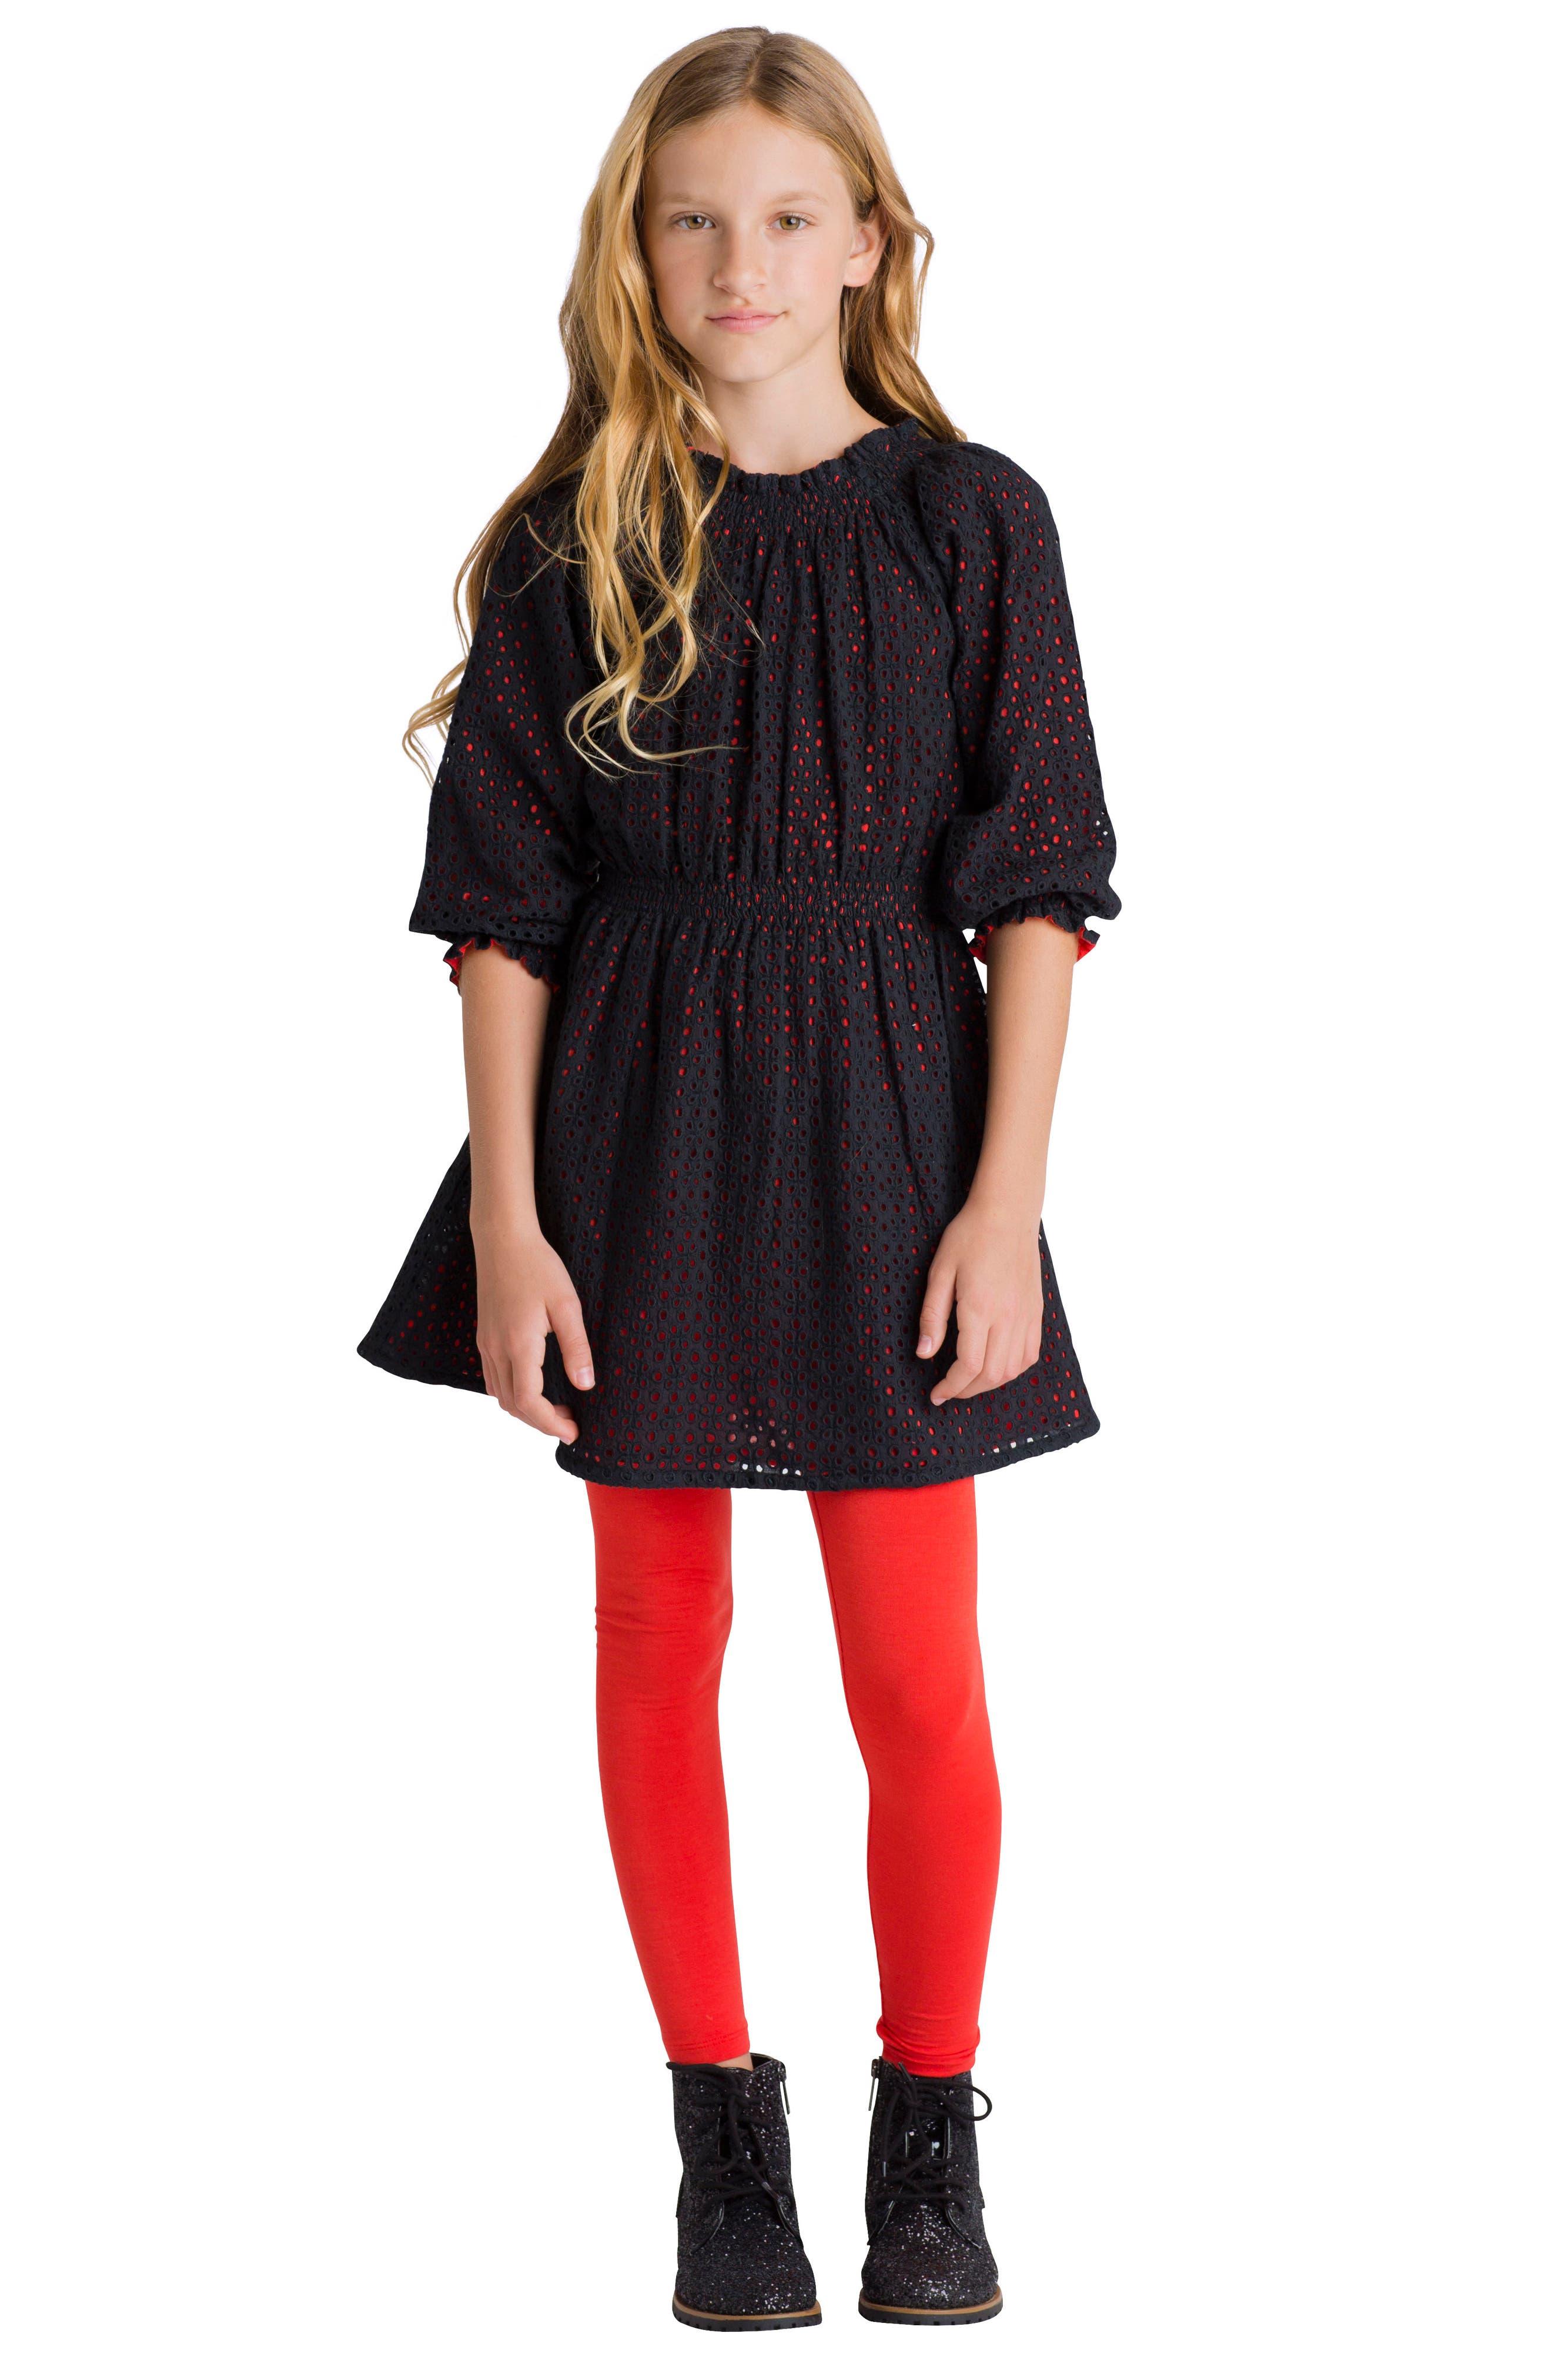 Spellbound Dress,                             Alternate thumbnail 2, color,                             Black